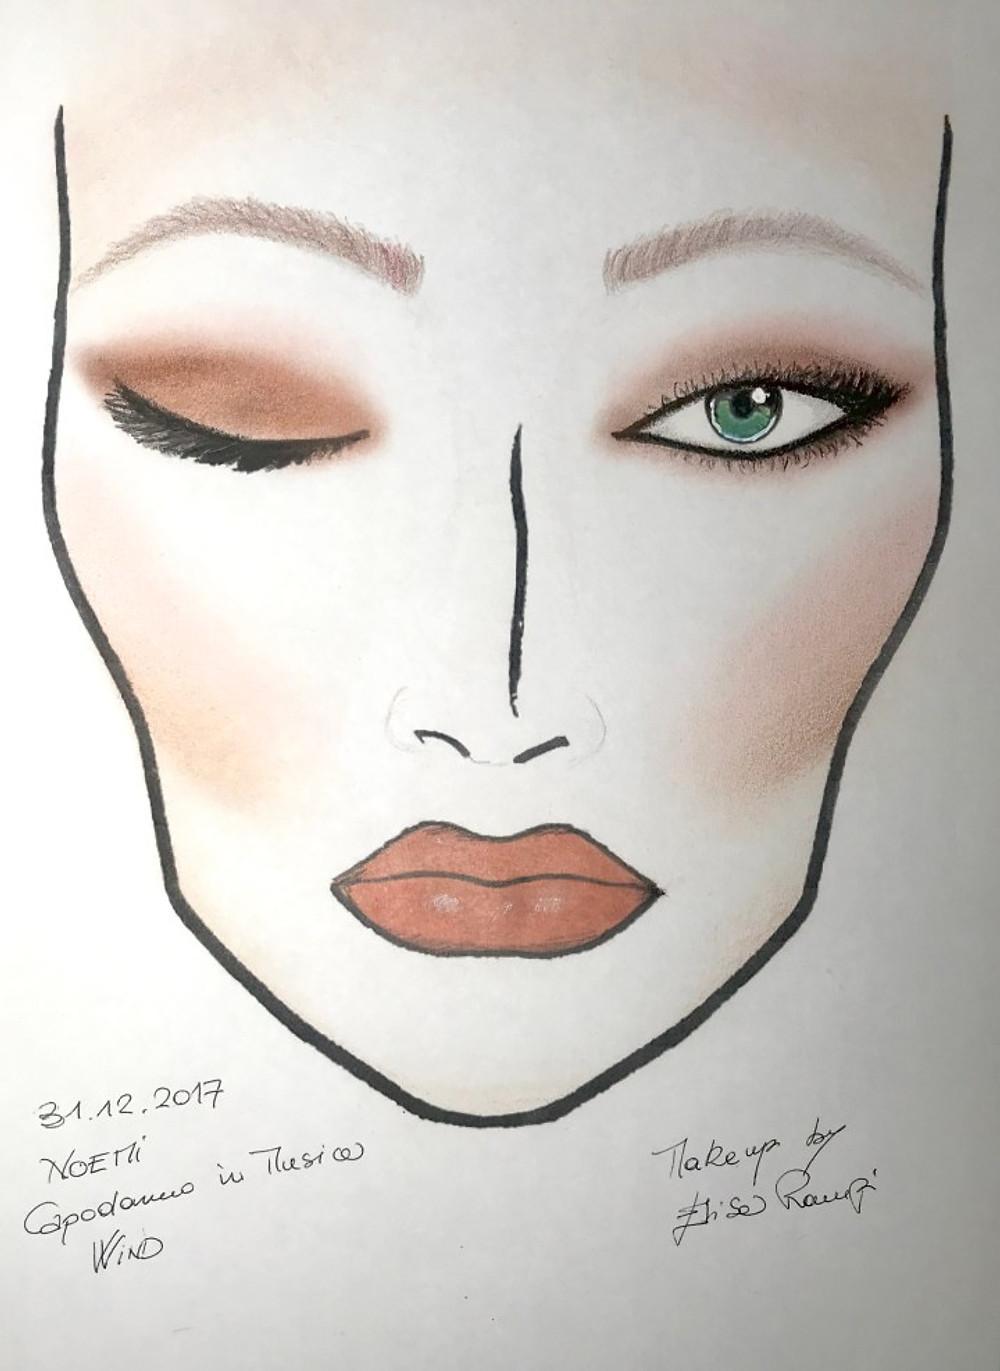 '17.12.31-noemi-wind-capodanno-in-musica-makeup-elisa-rampi-face-chart - 2 di 11